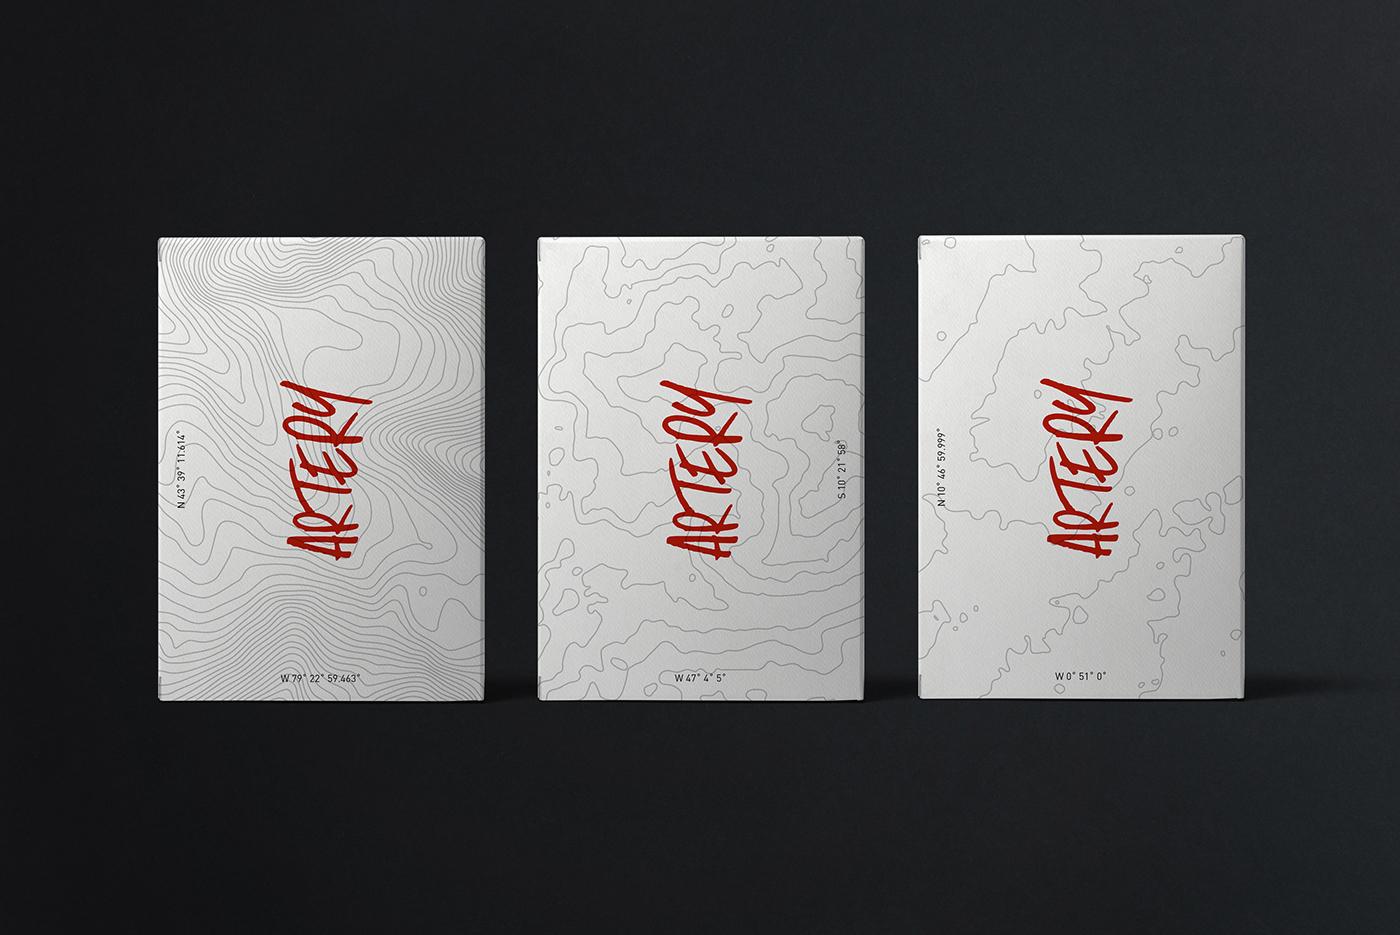 artery Topographic maps coordinates Global artisans Generations art craft kraft paper